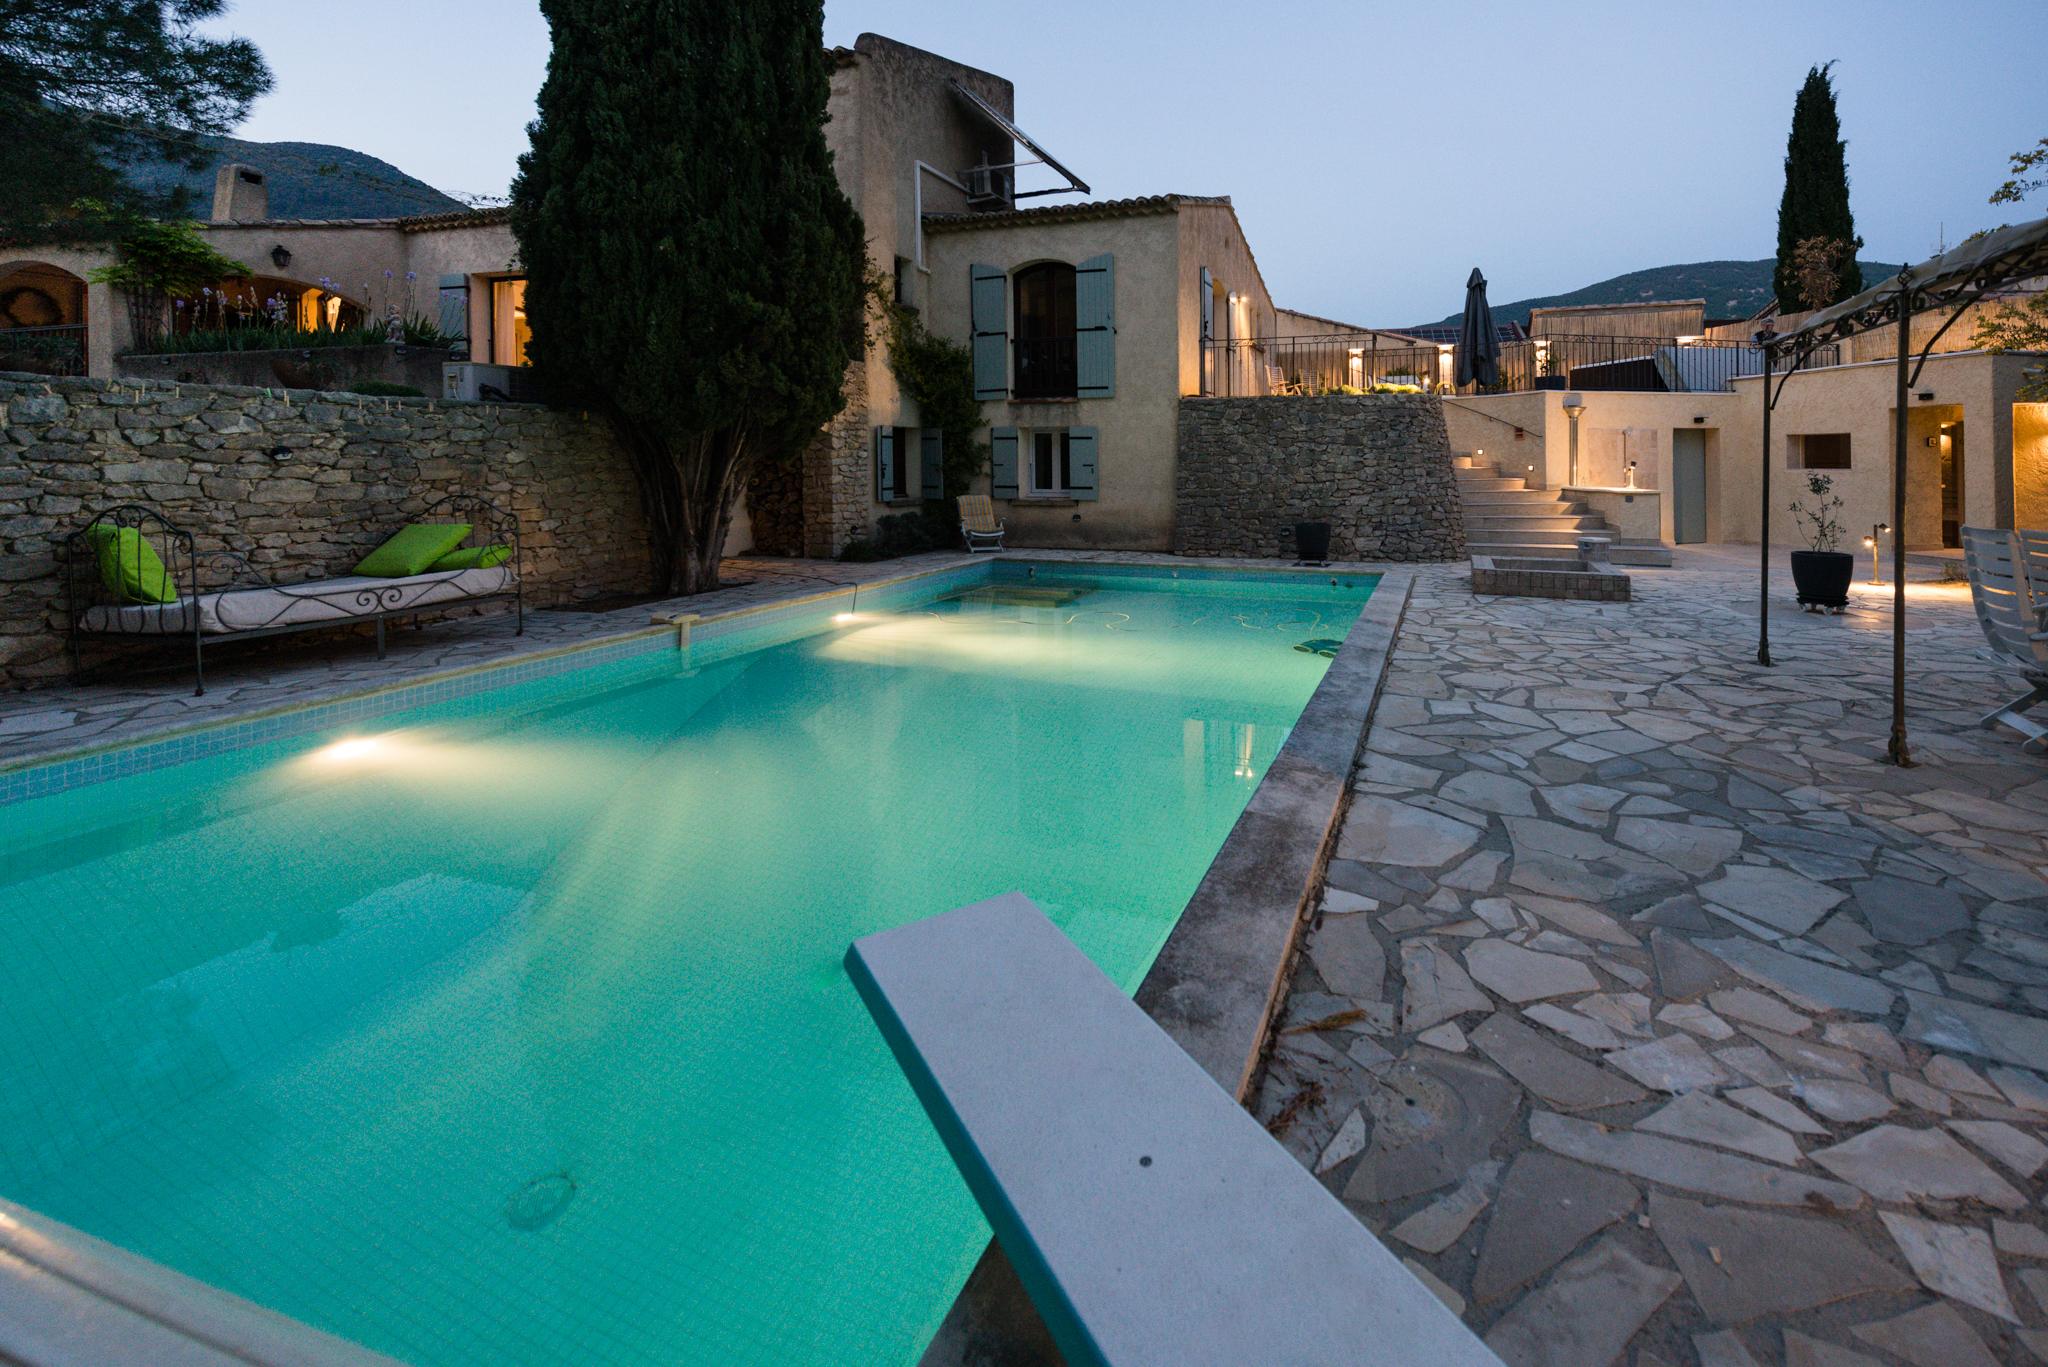 feriebolig-provence-privat-pool-DSC_4804.jpg